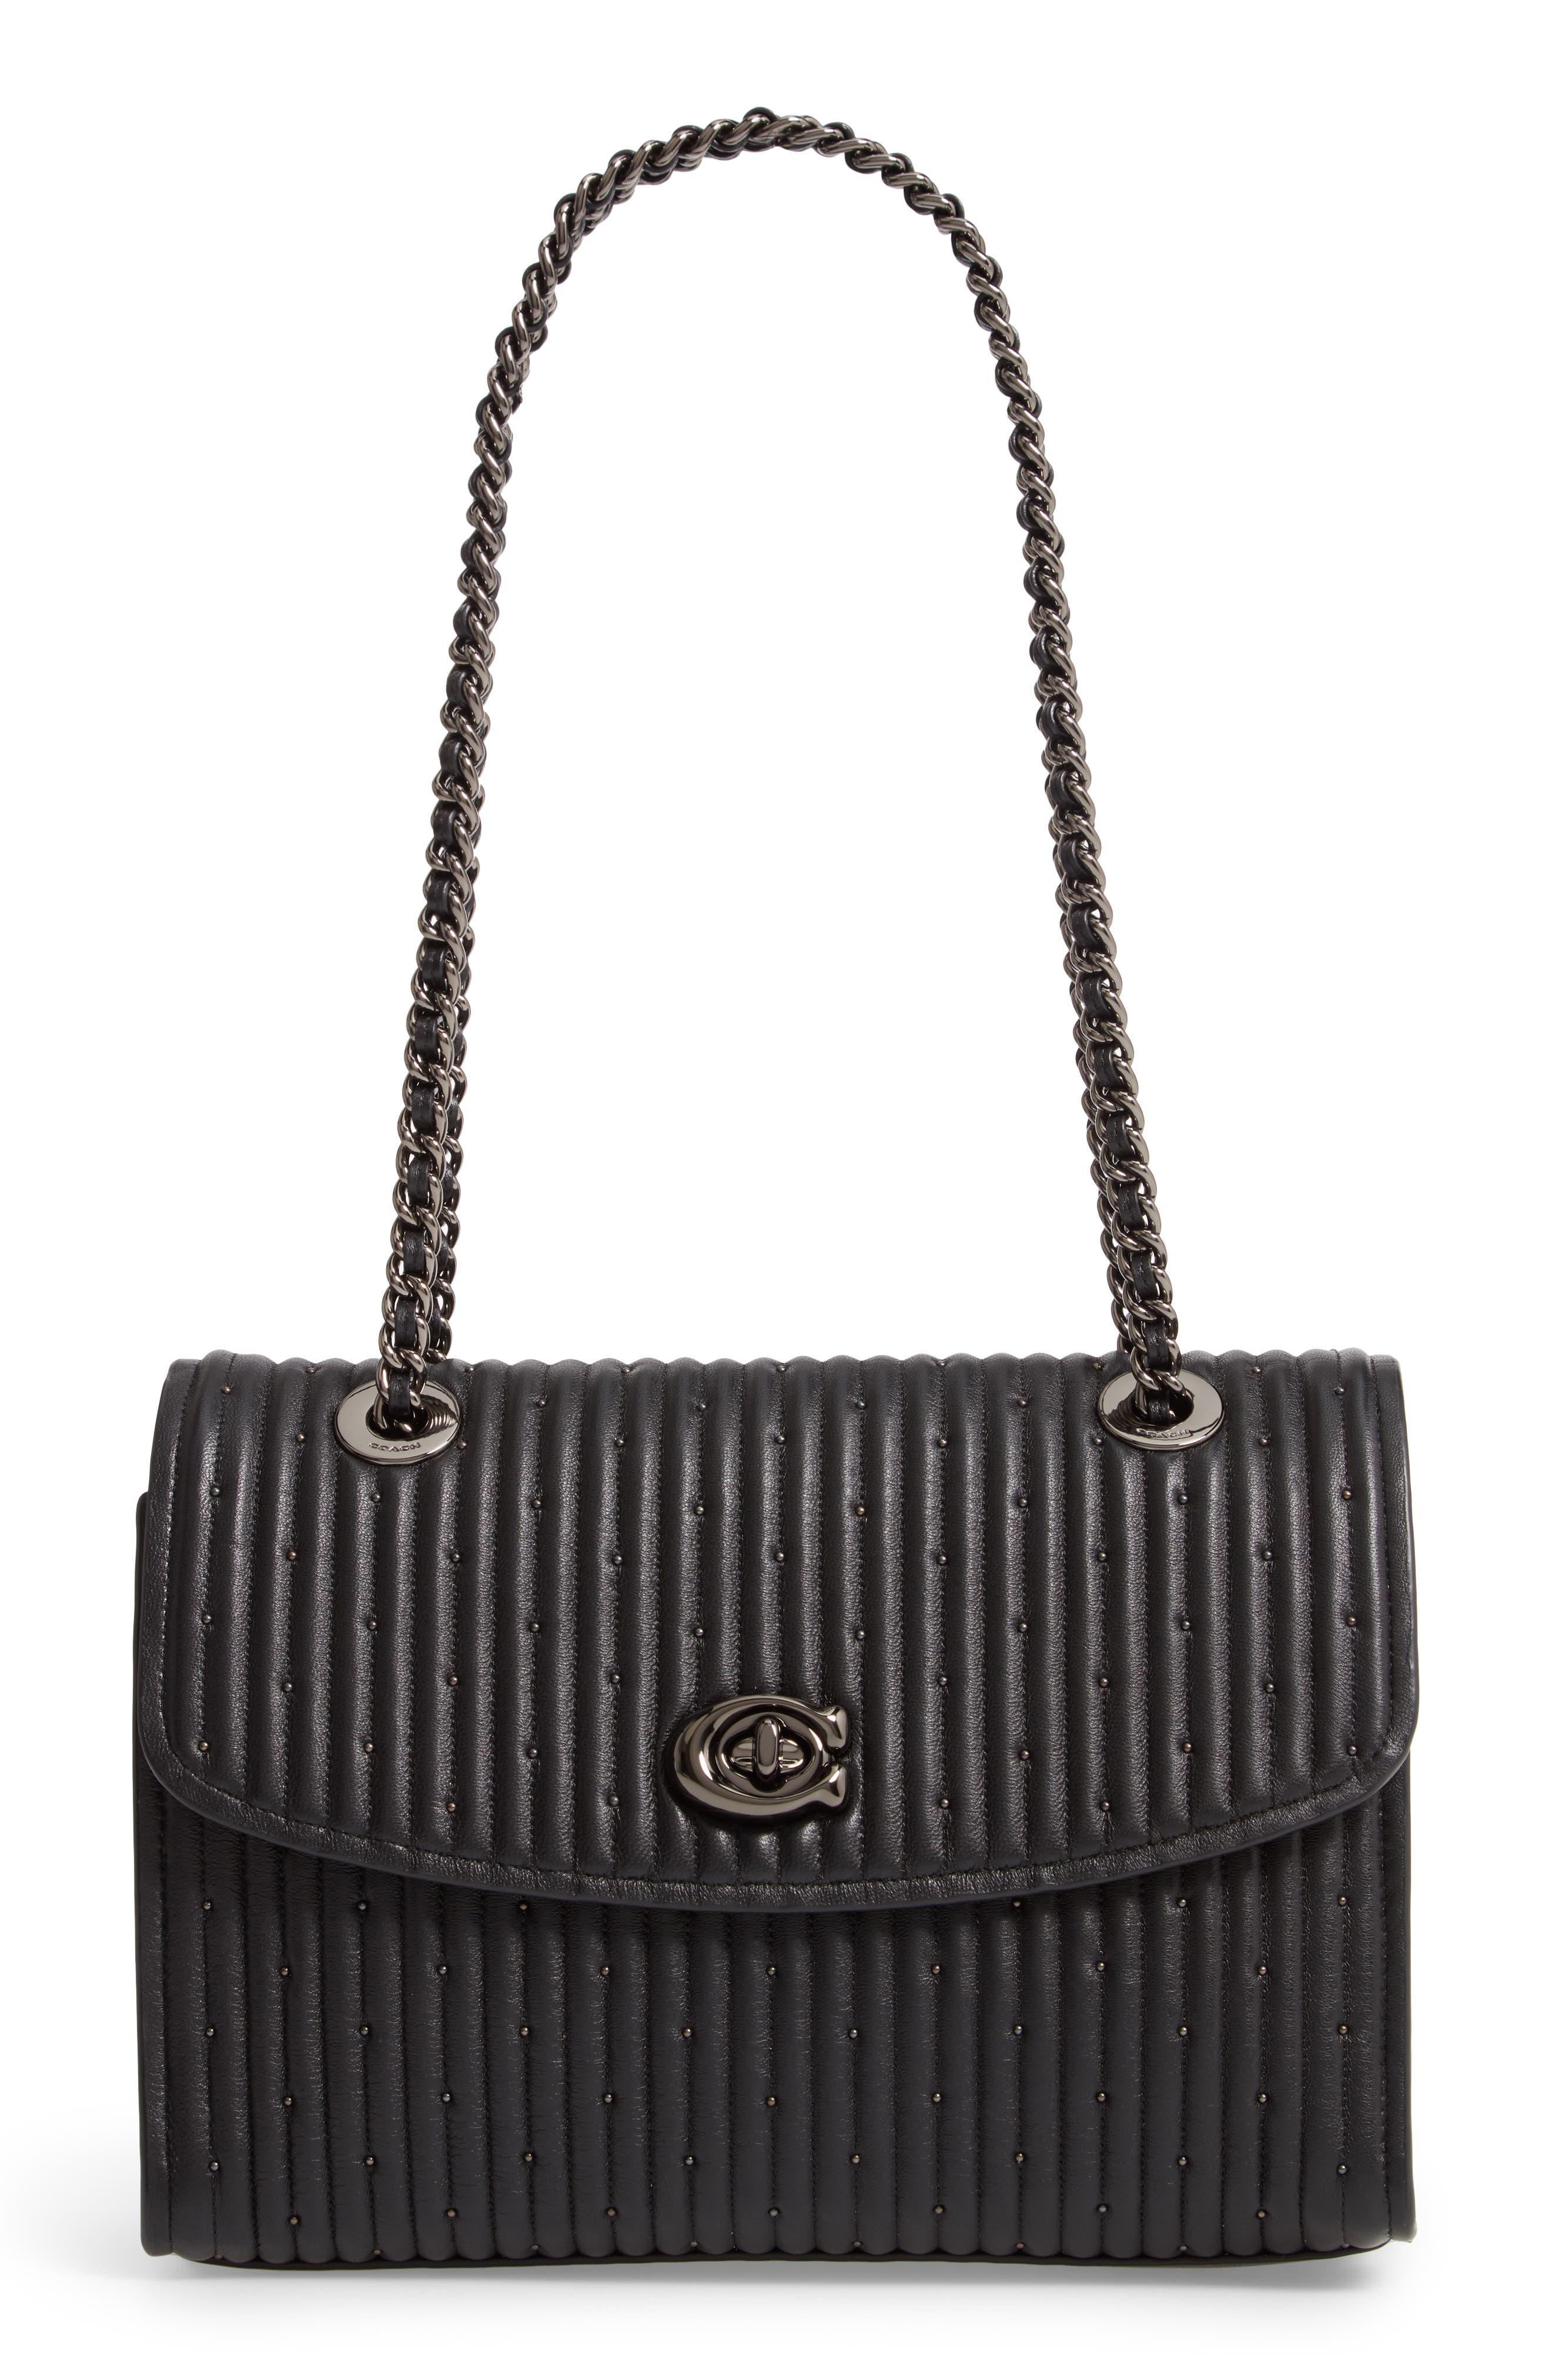 COACH, Parker Quilted Leather Shoulder Bag, Main thumbnail 1, color, BLACK